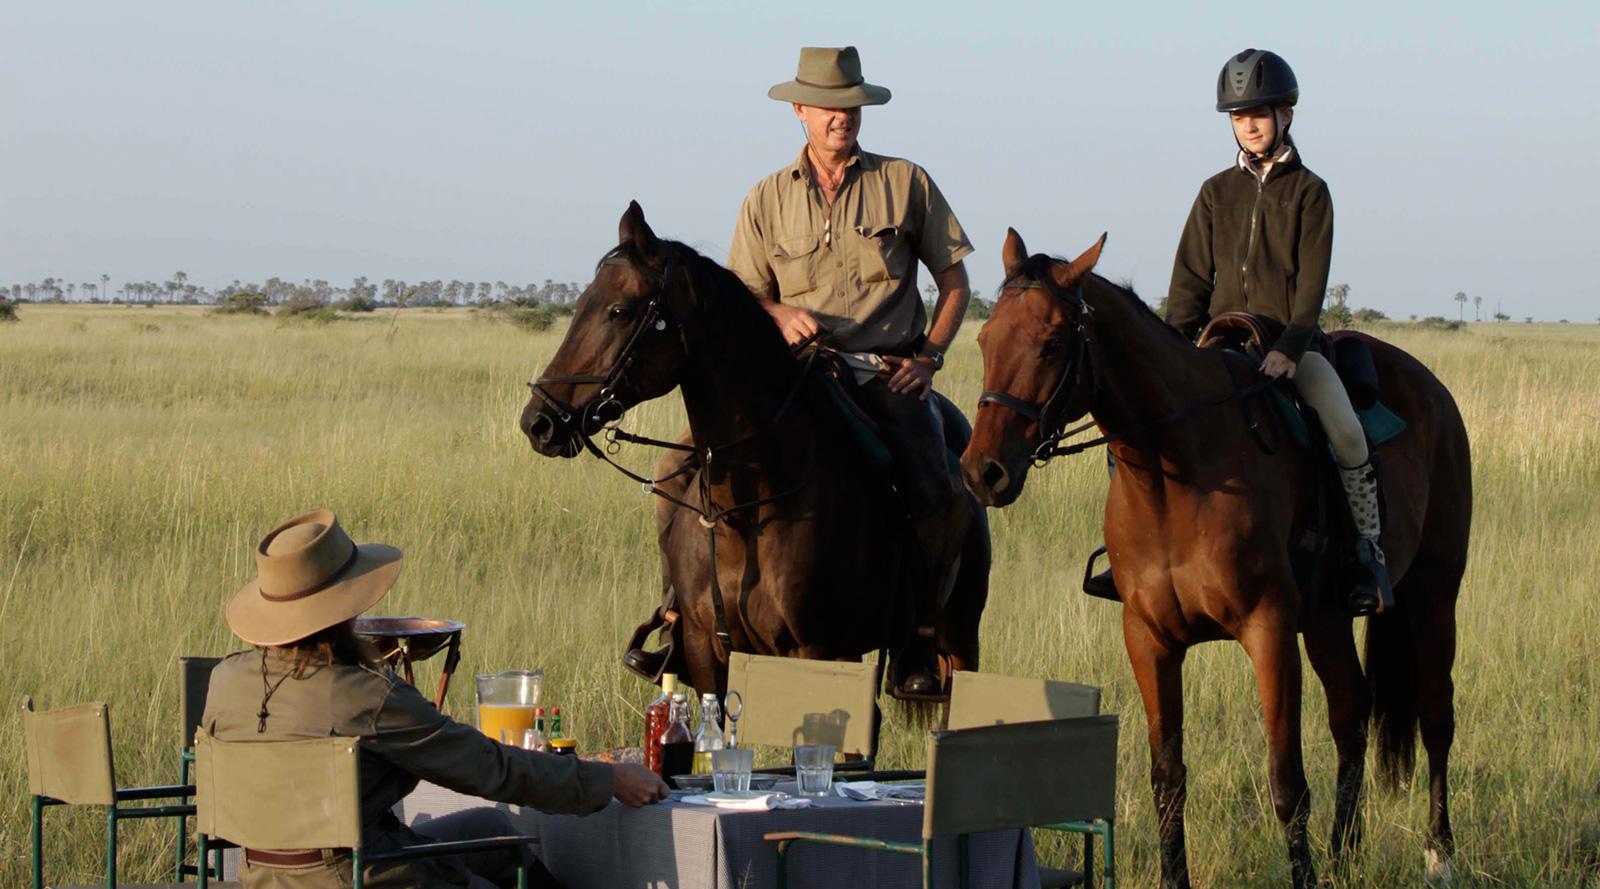 © Image courtesy of Uncharted Africa Safari co.